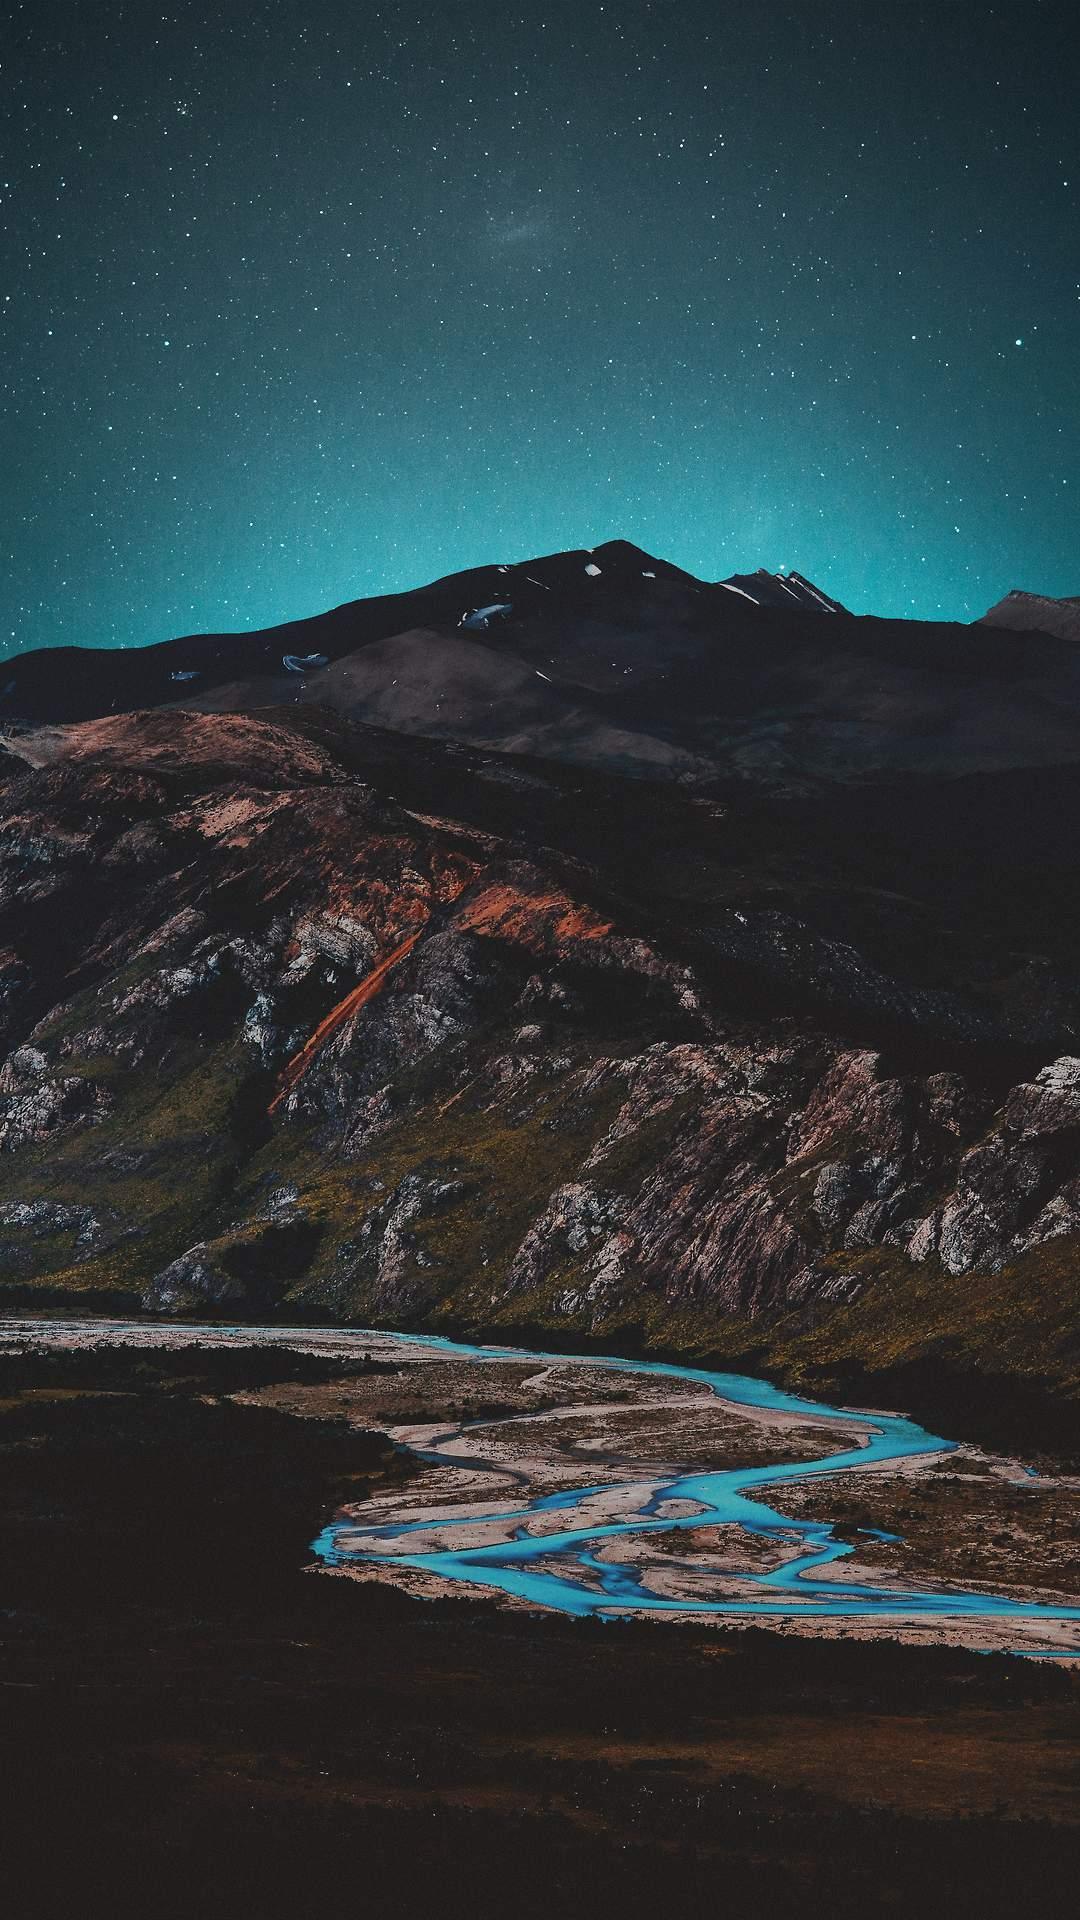 Starry Night Mountain Lake iPhone Wallpaper